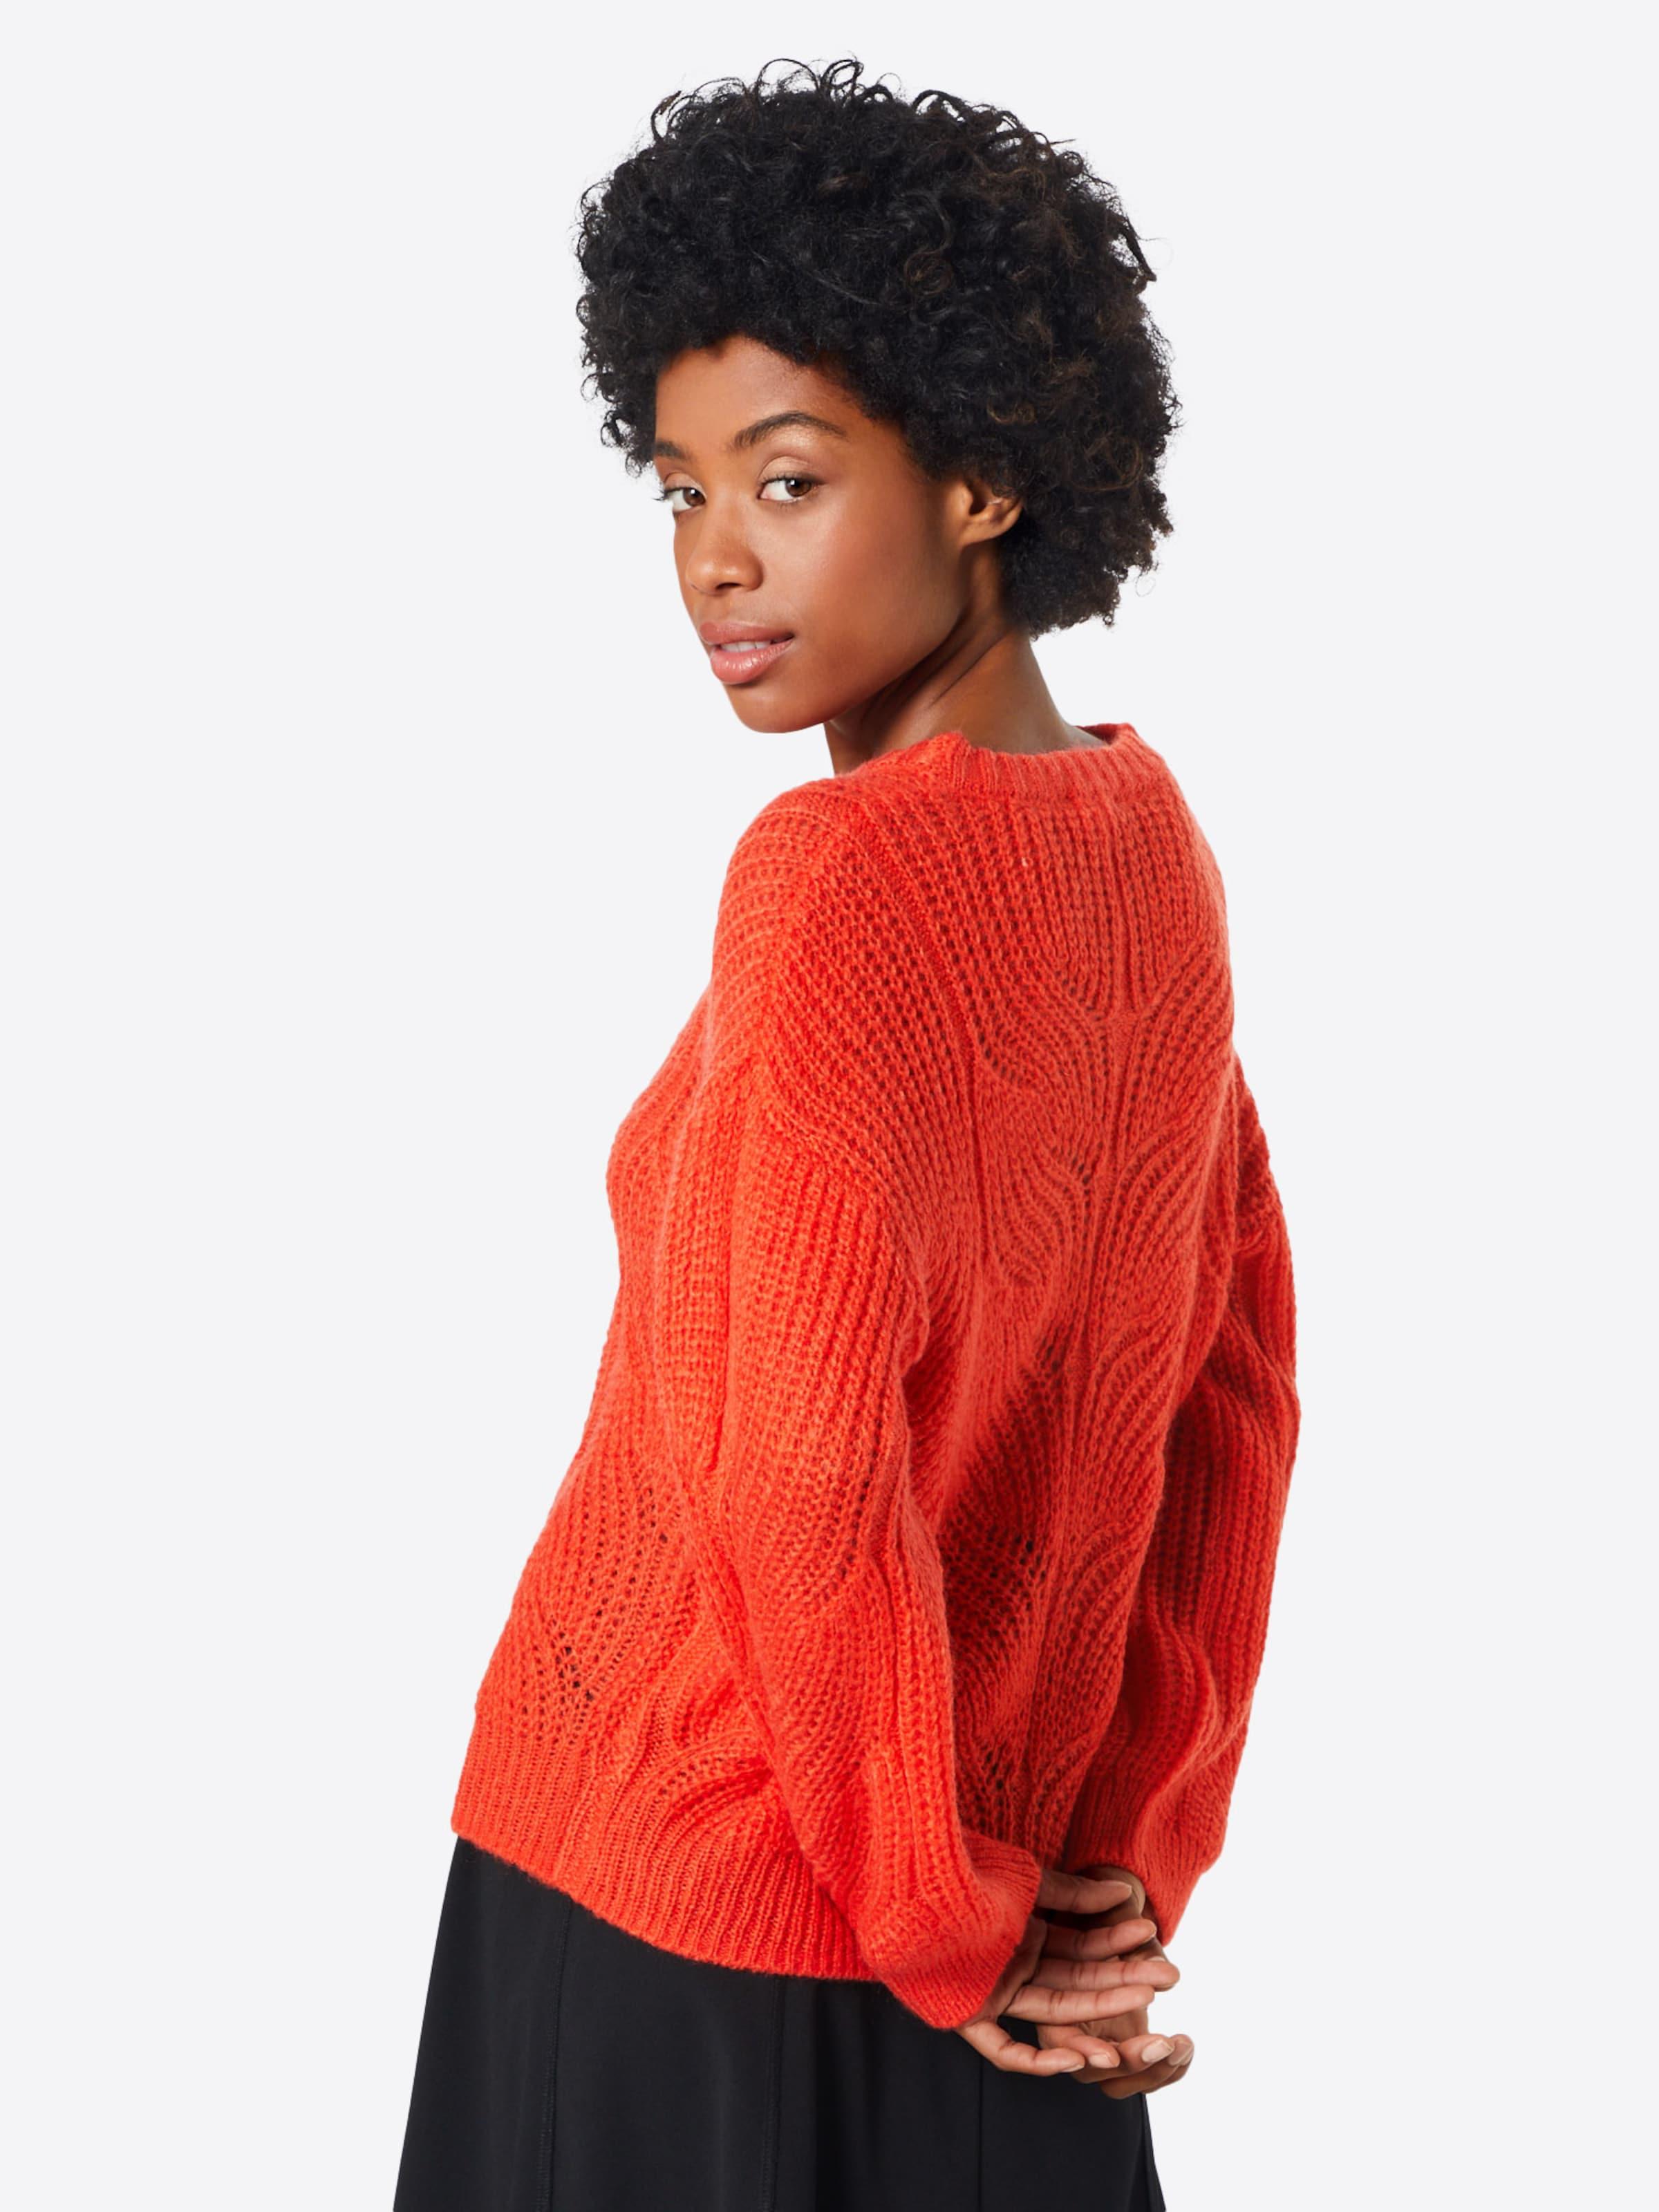 Talkabout Orangerot Pullover In In Pullover Orangerot Talkabout Talkabout Pullover Orangerot In 3jRq54AL